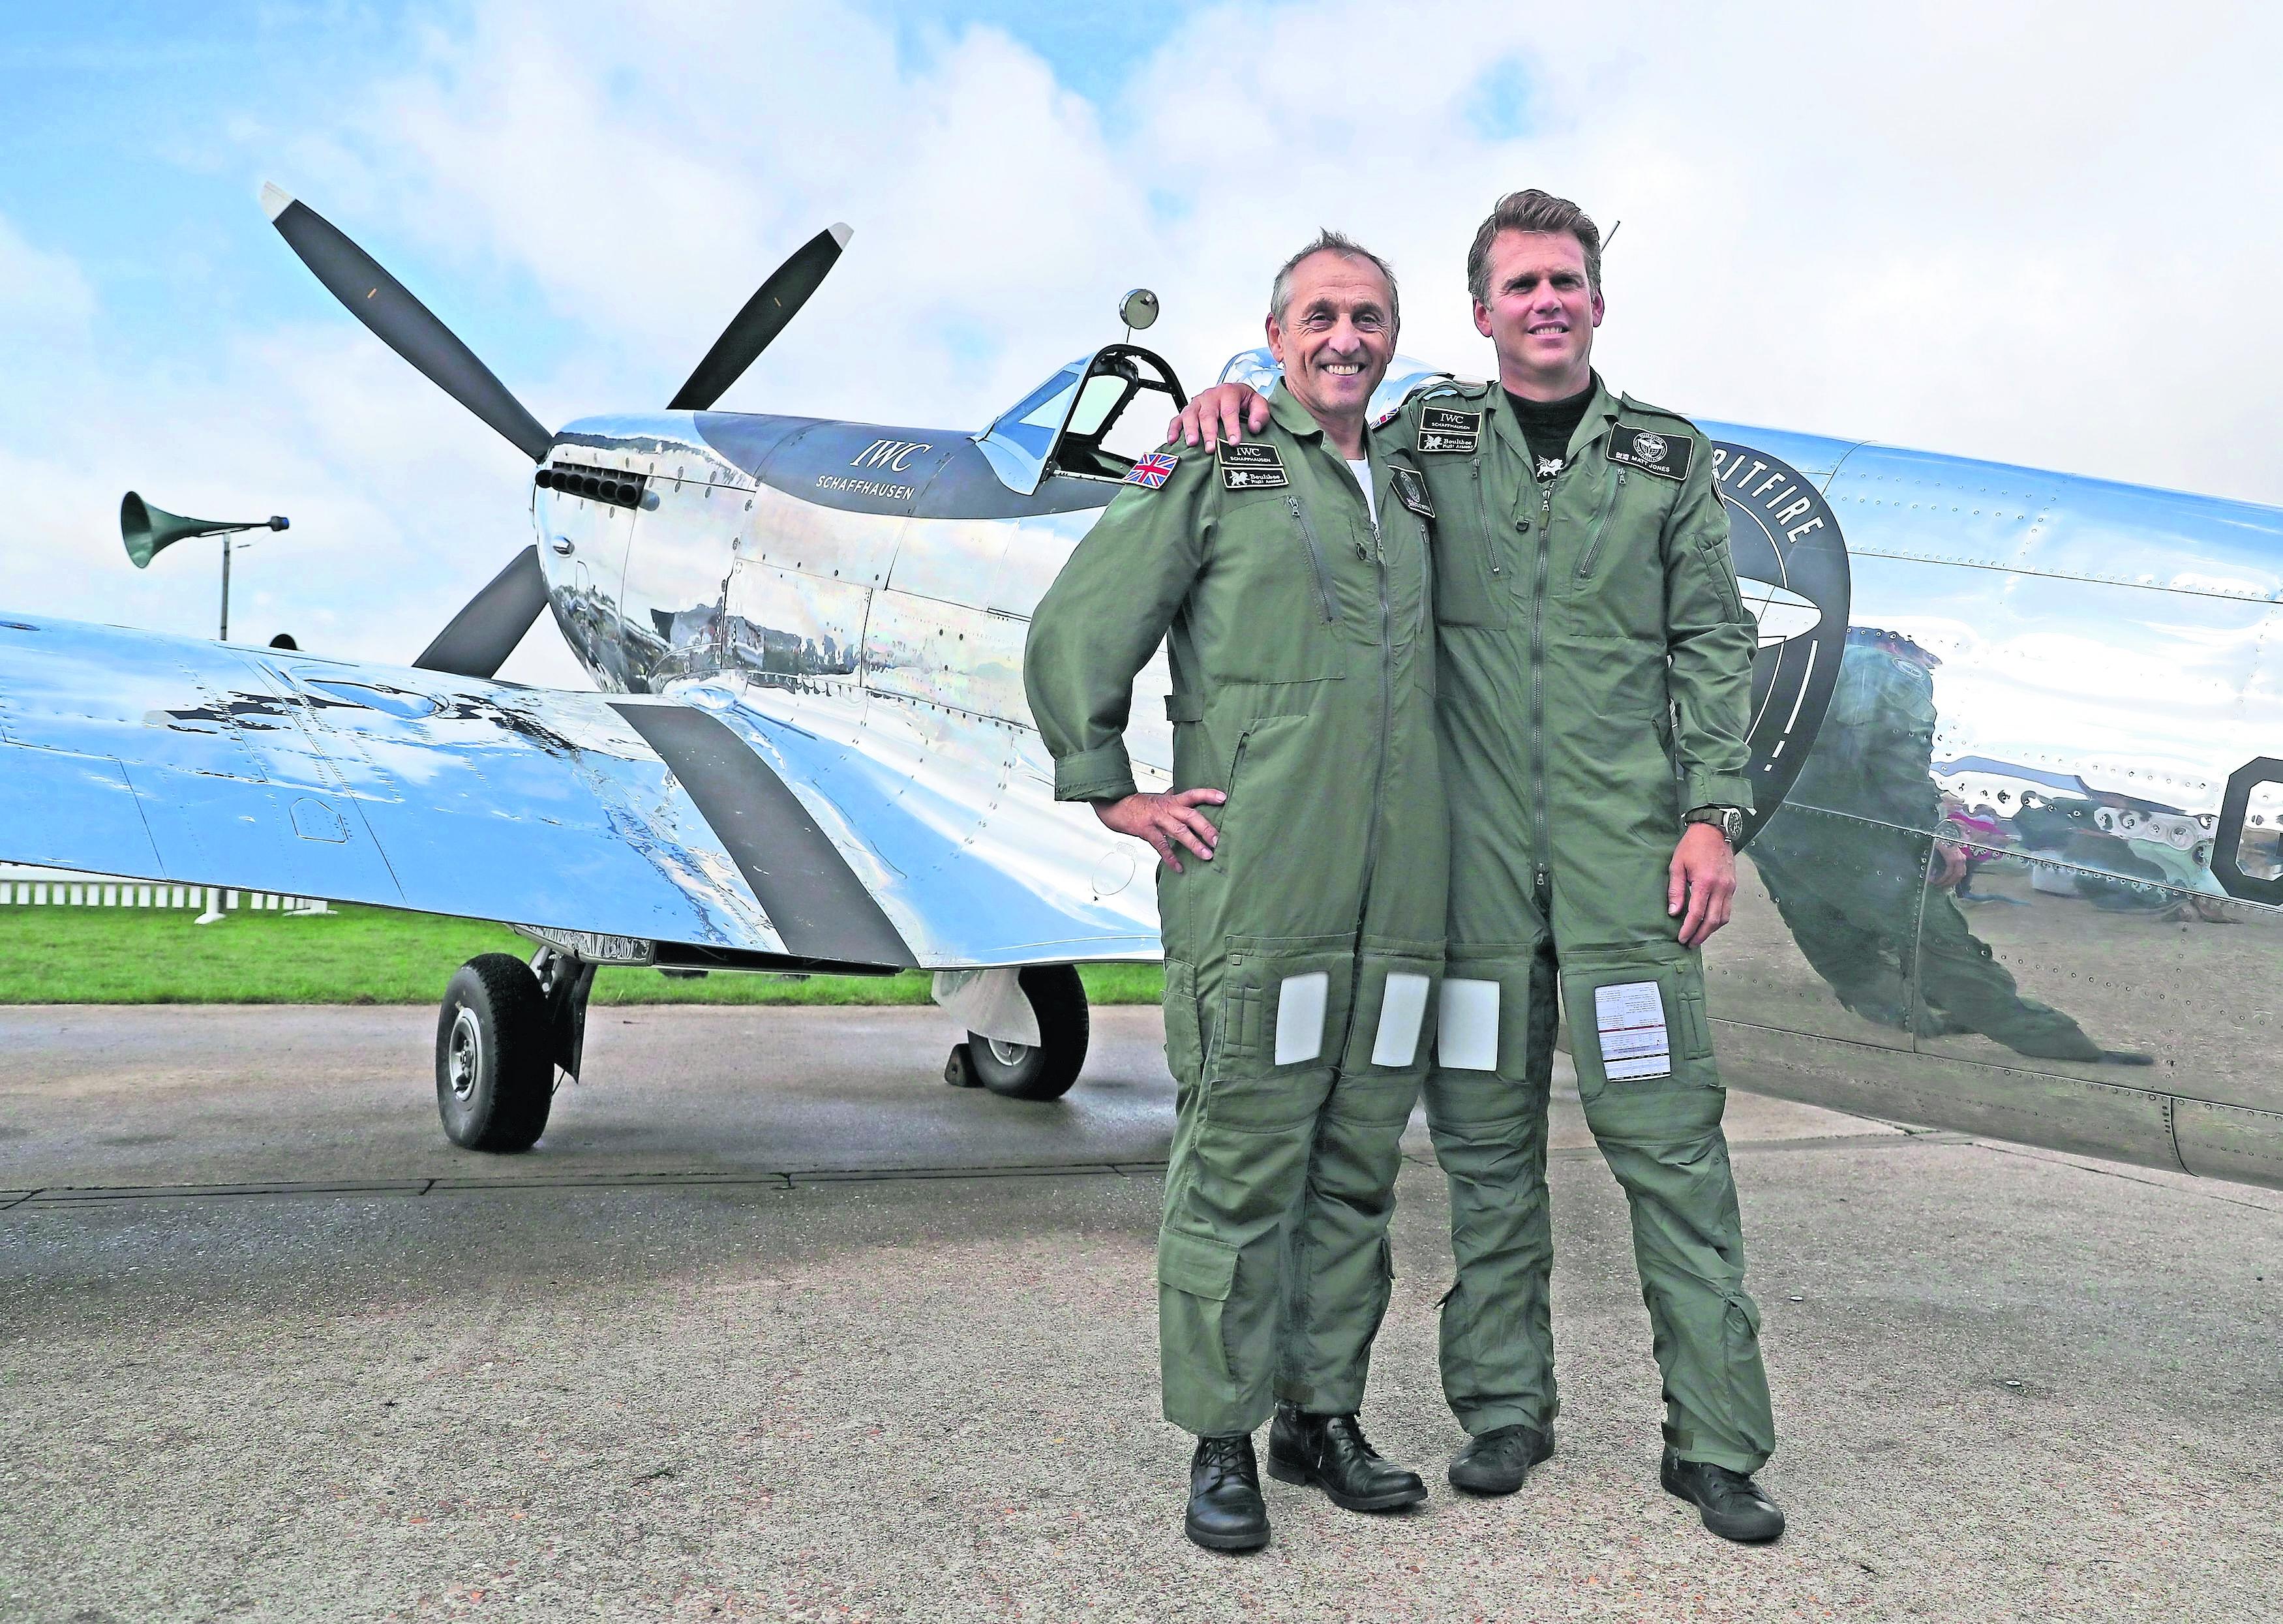 aviones segunda guerra mundial se desmilitariza vuelta al mundo aventura vuelo sin armas Inglaterra